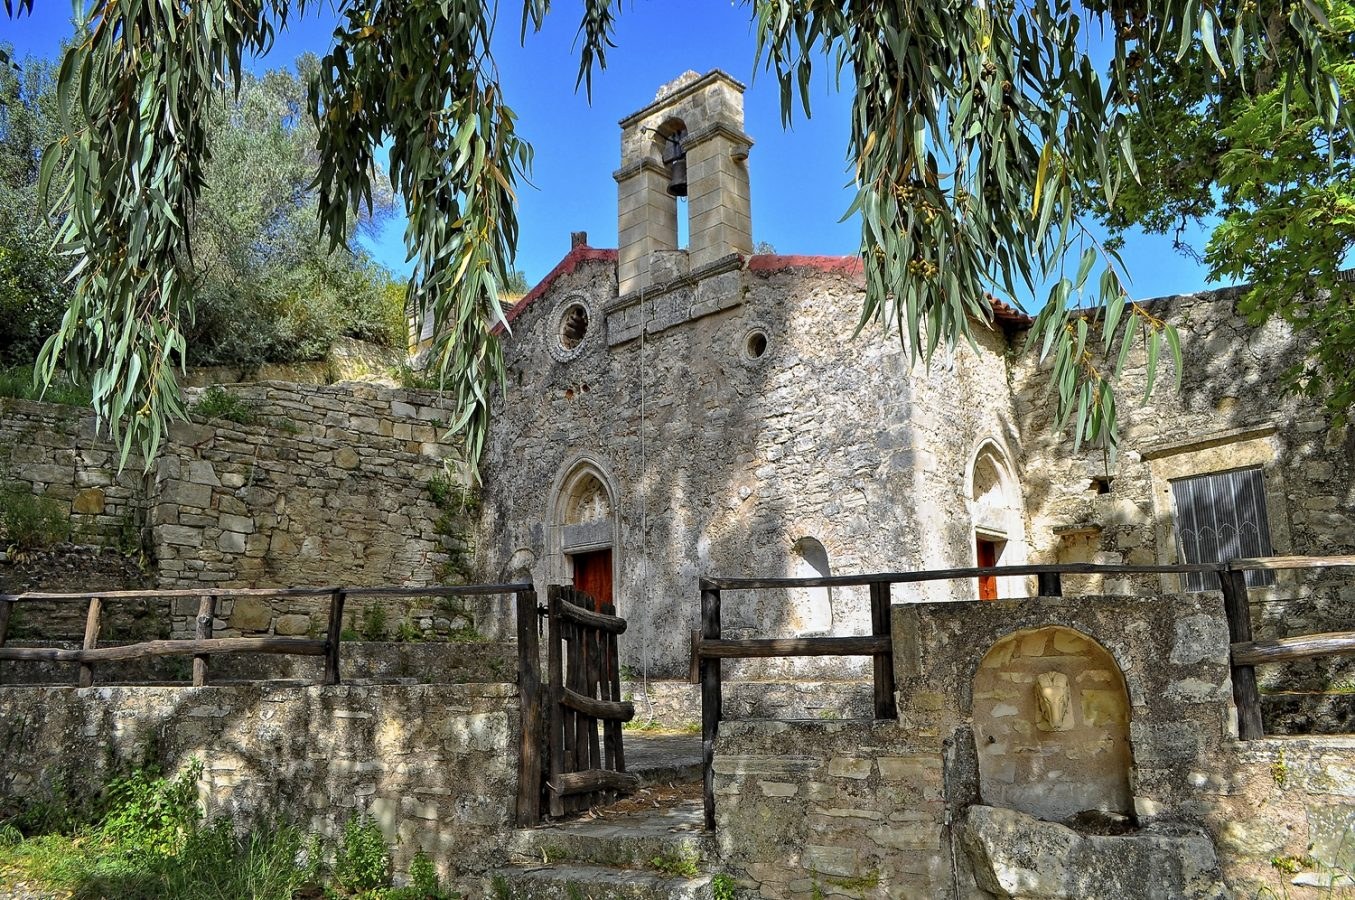 The Church of Agios Haralampos & Panagia